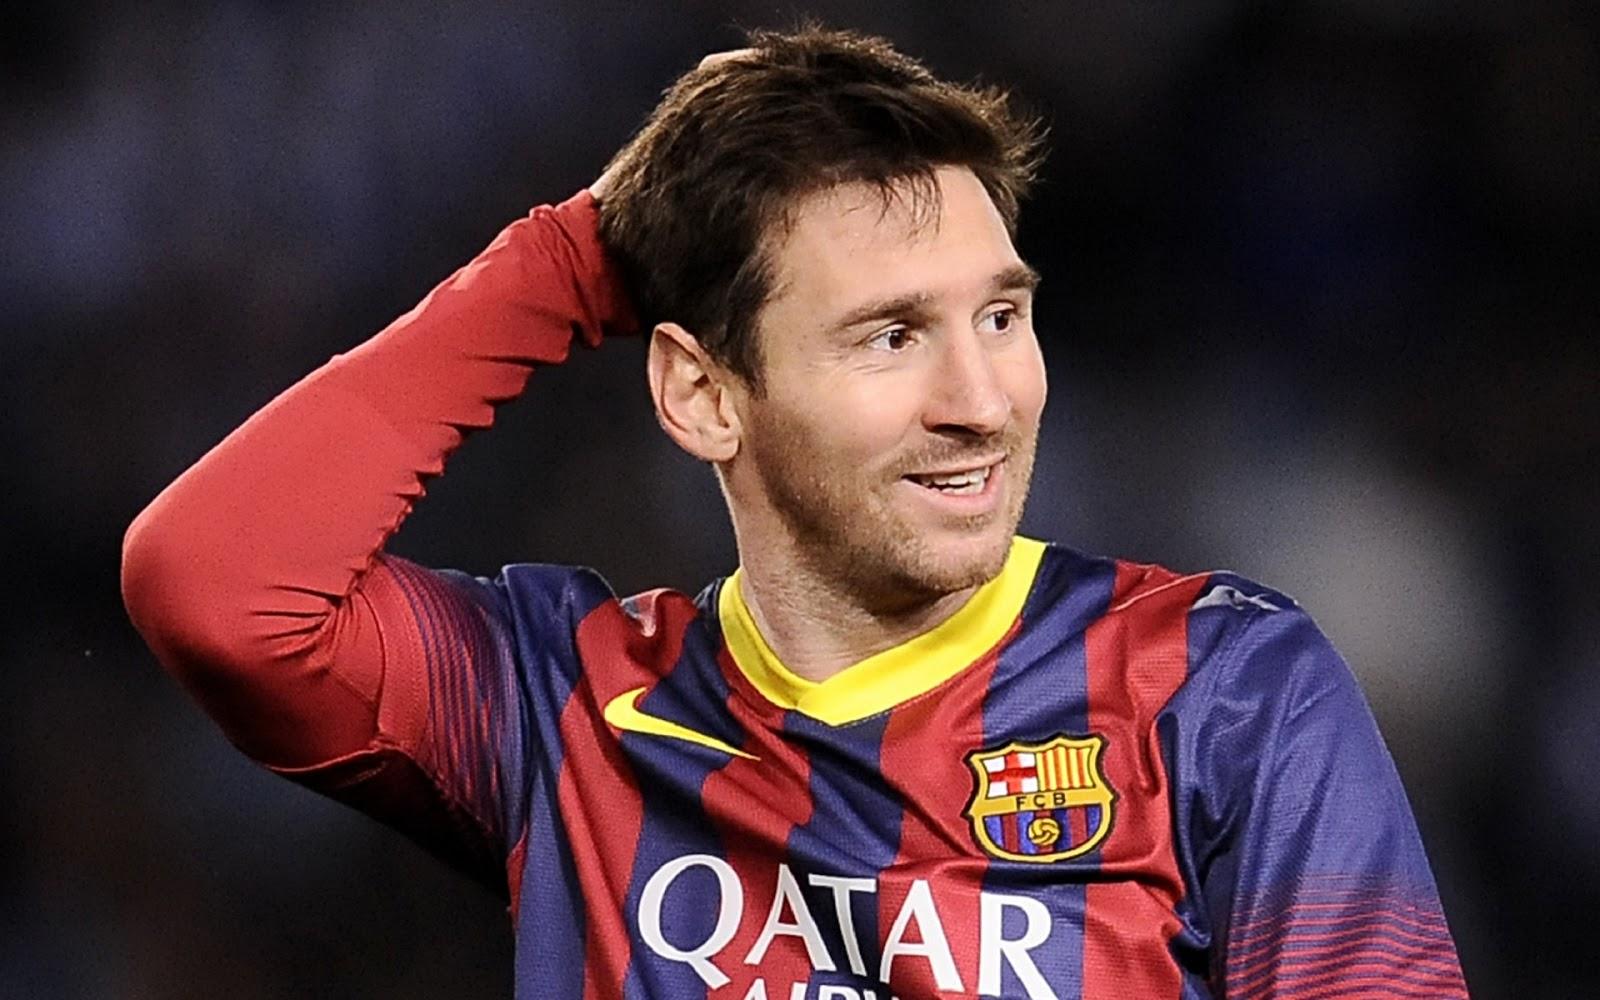 Hinh-anh-dep-nhat-cua-Lionel-Messi-%25282